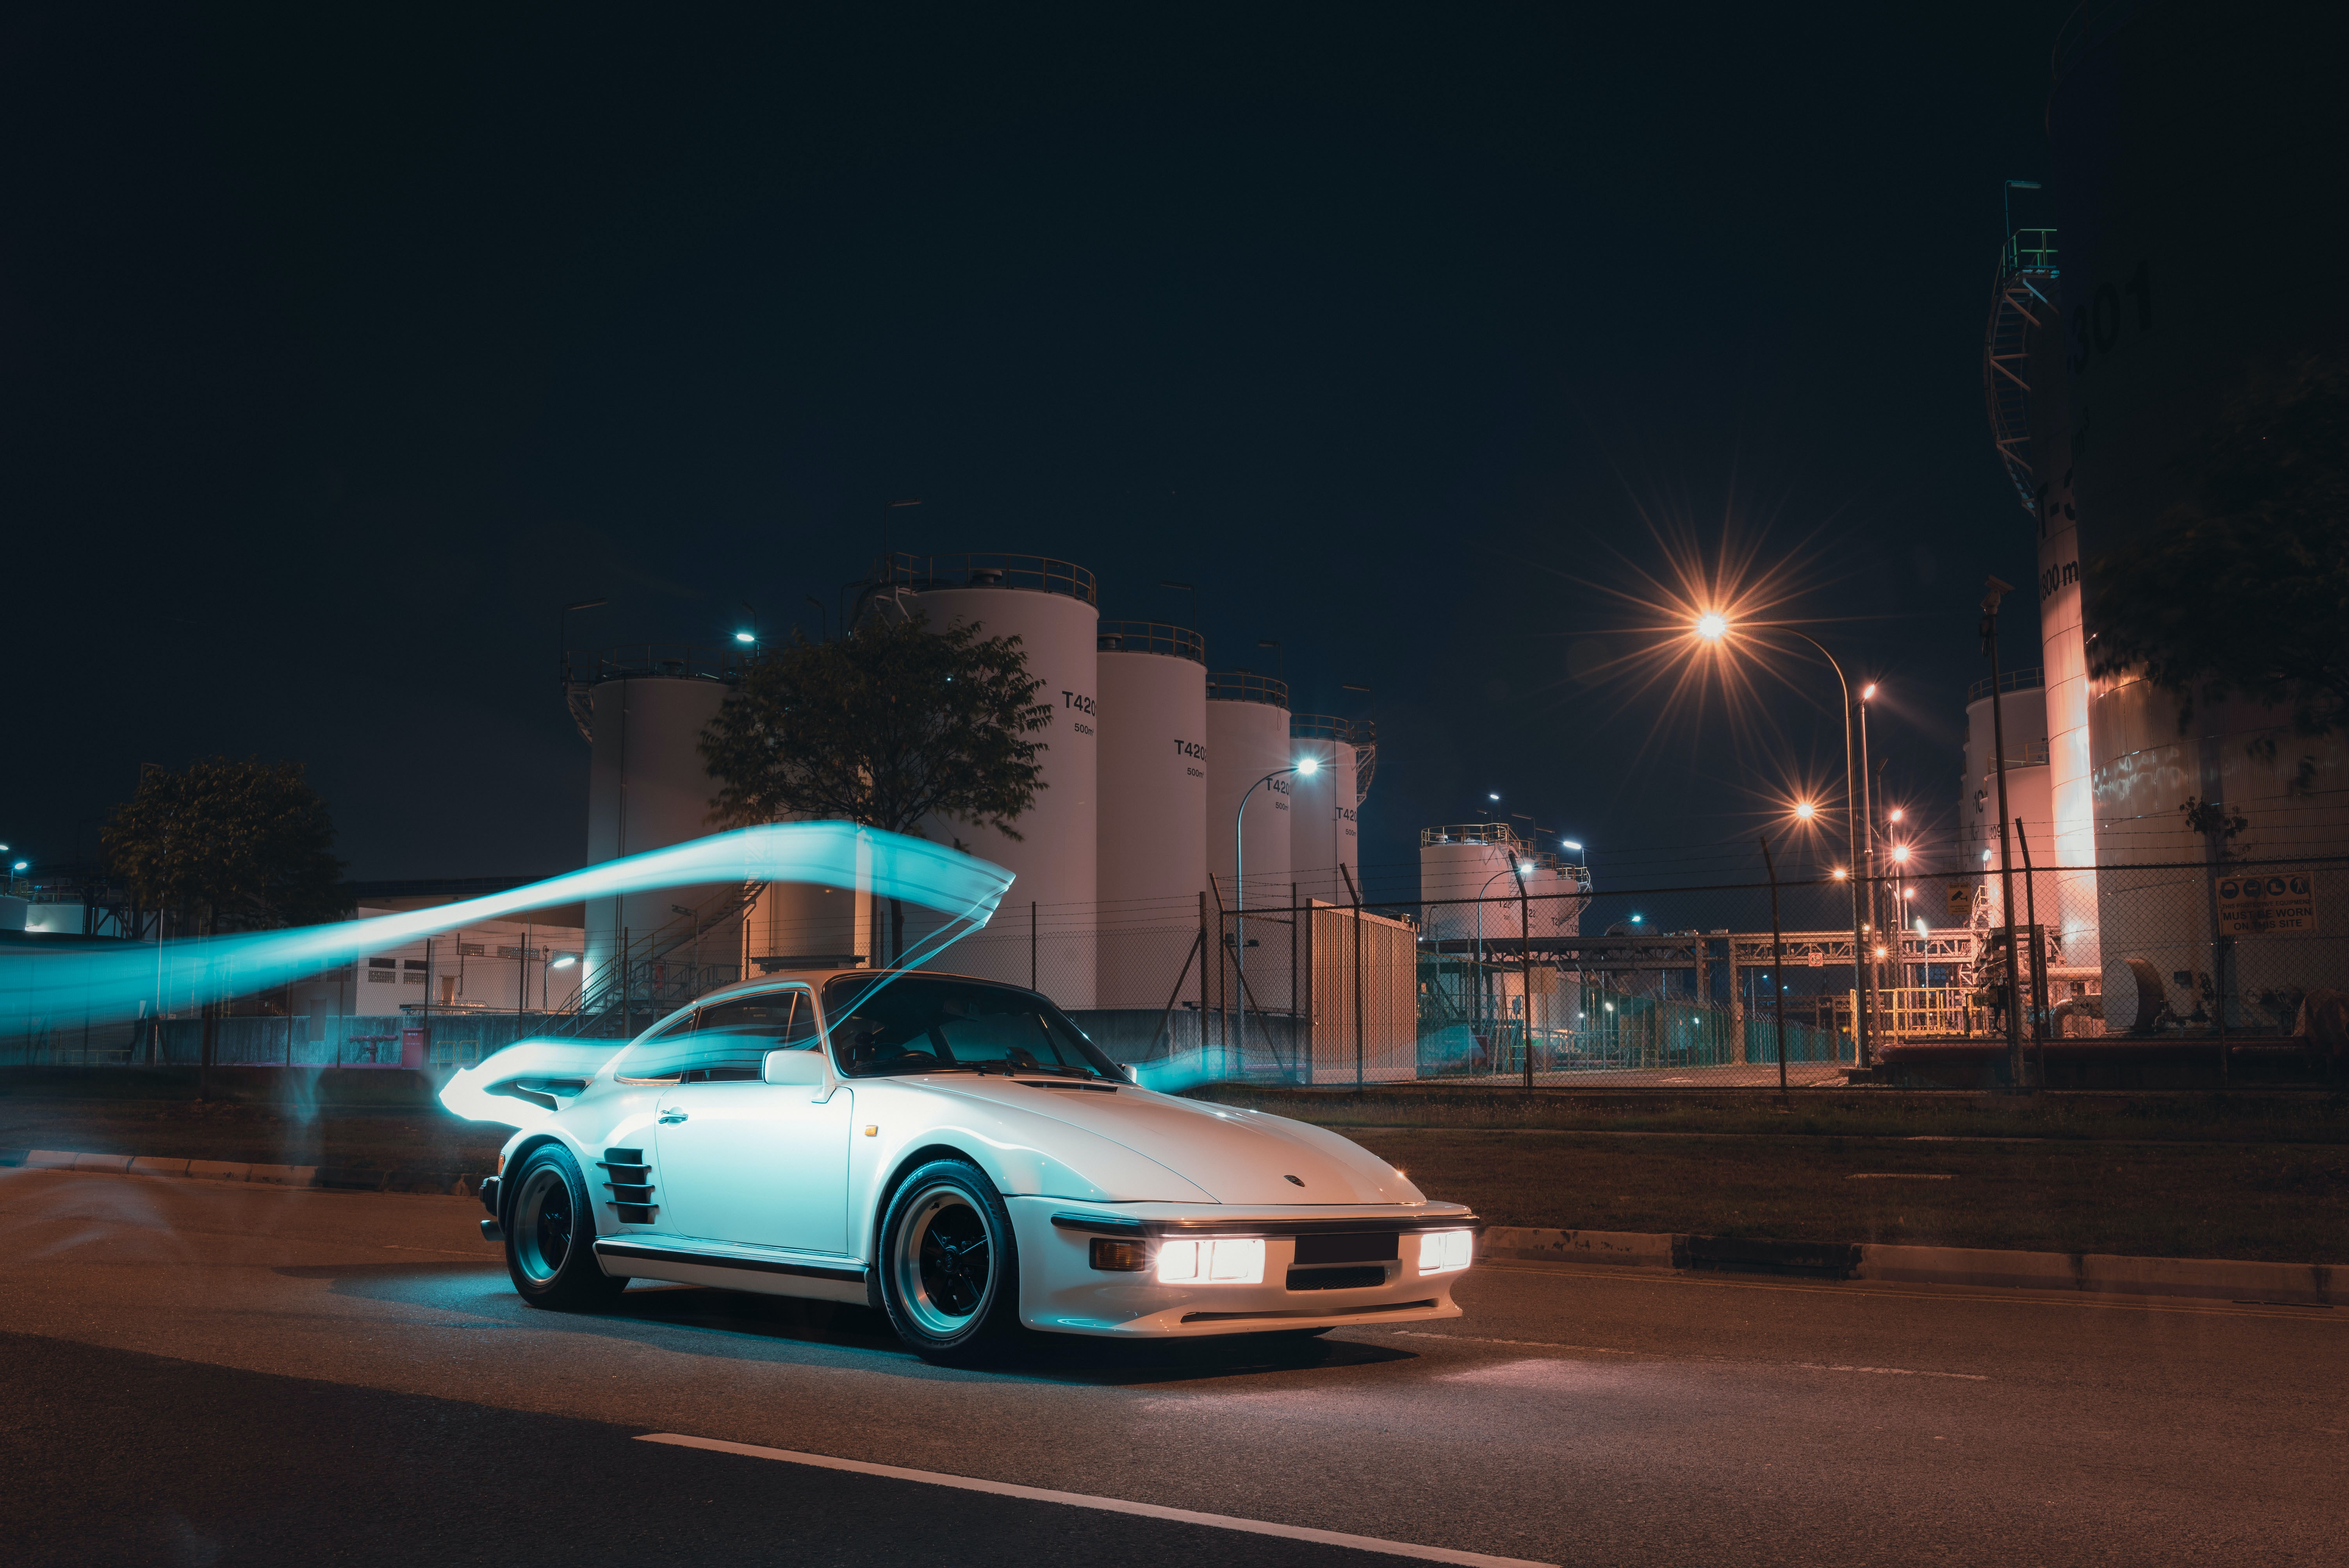 porsche 911 turbo classic 4k 1620169892 - Porsche 911 Turbo Classic 4k - Porsche 911 Turbo Classic 4k wallpapers